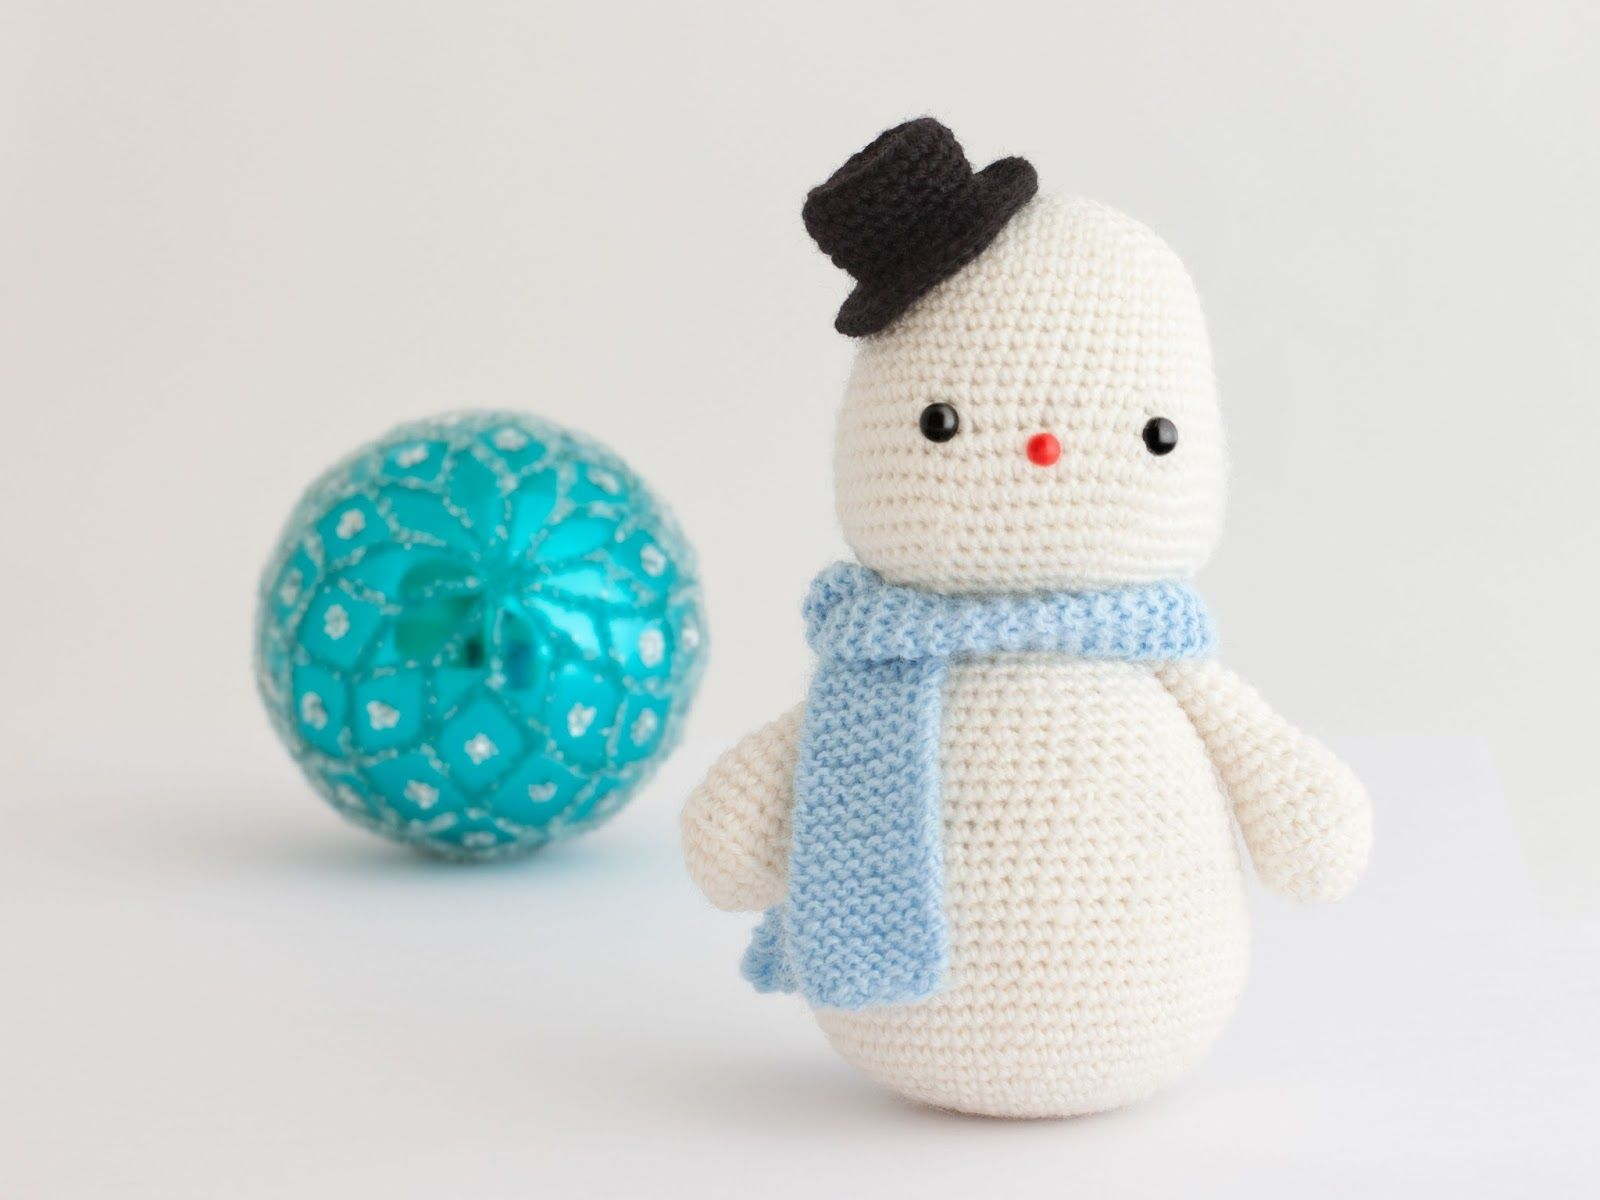 Amigurumi Snowman : Amigurumi snowman free crochet pattern tutorial christmas